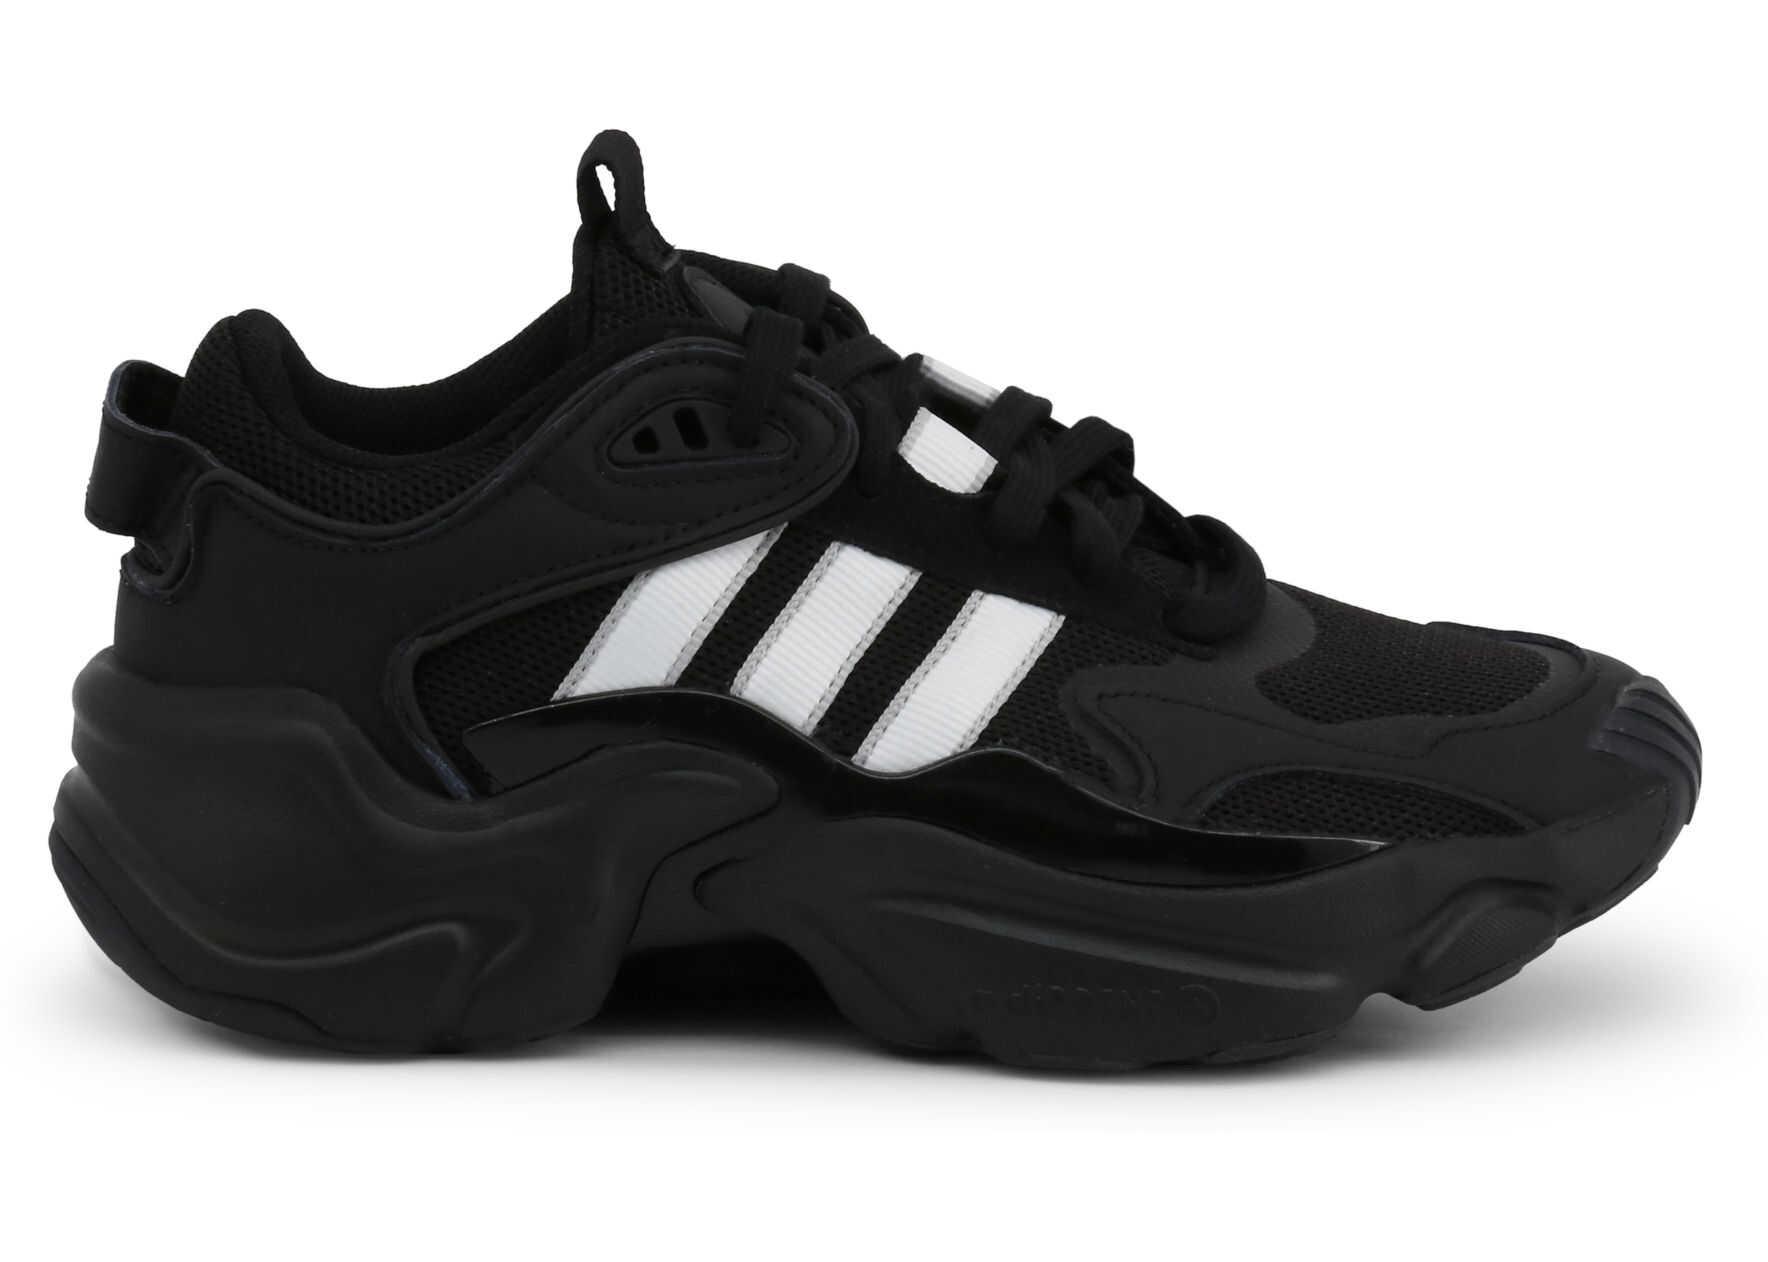 adidas Magmurrunner* BLACK